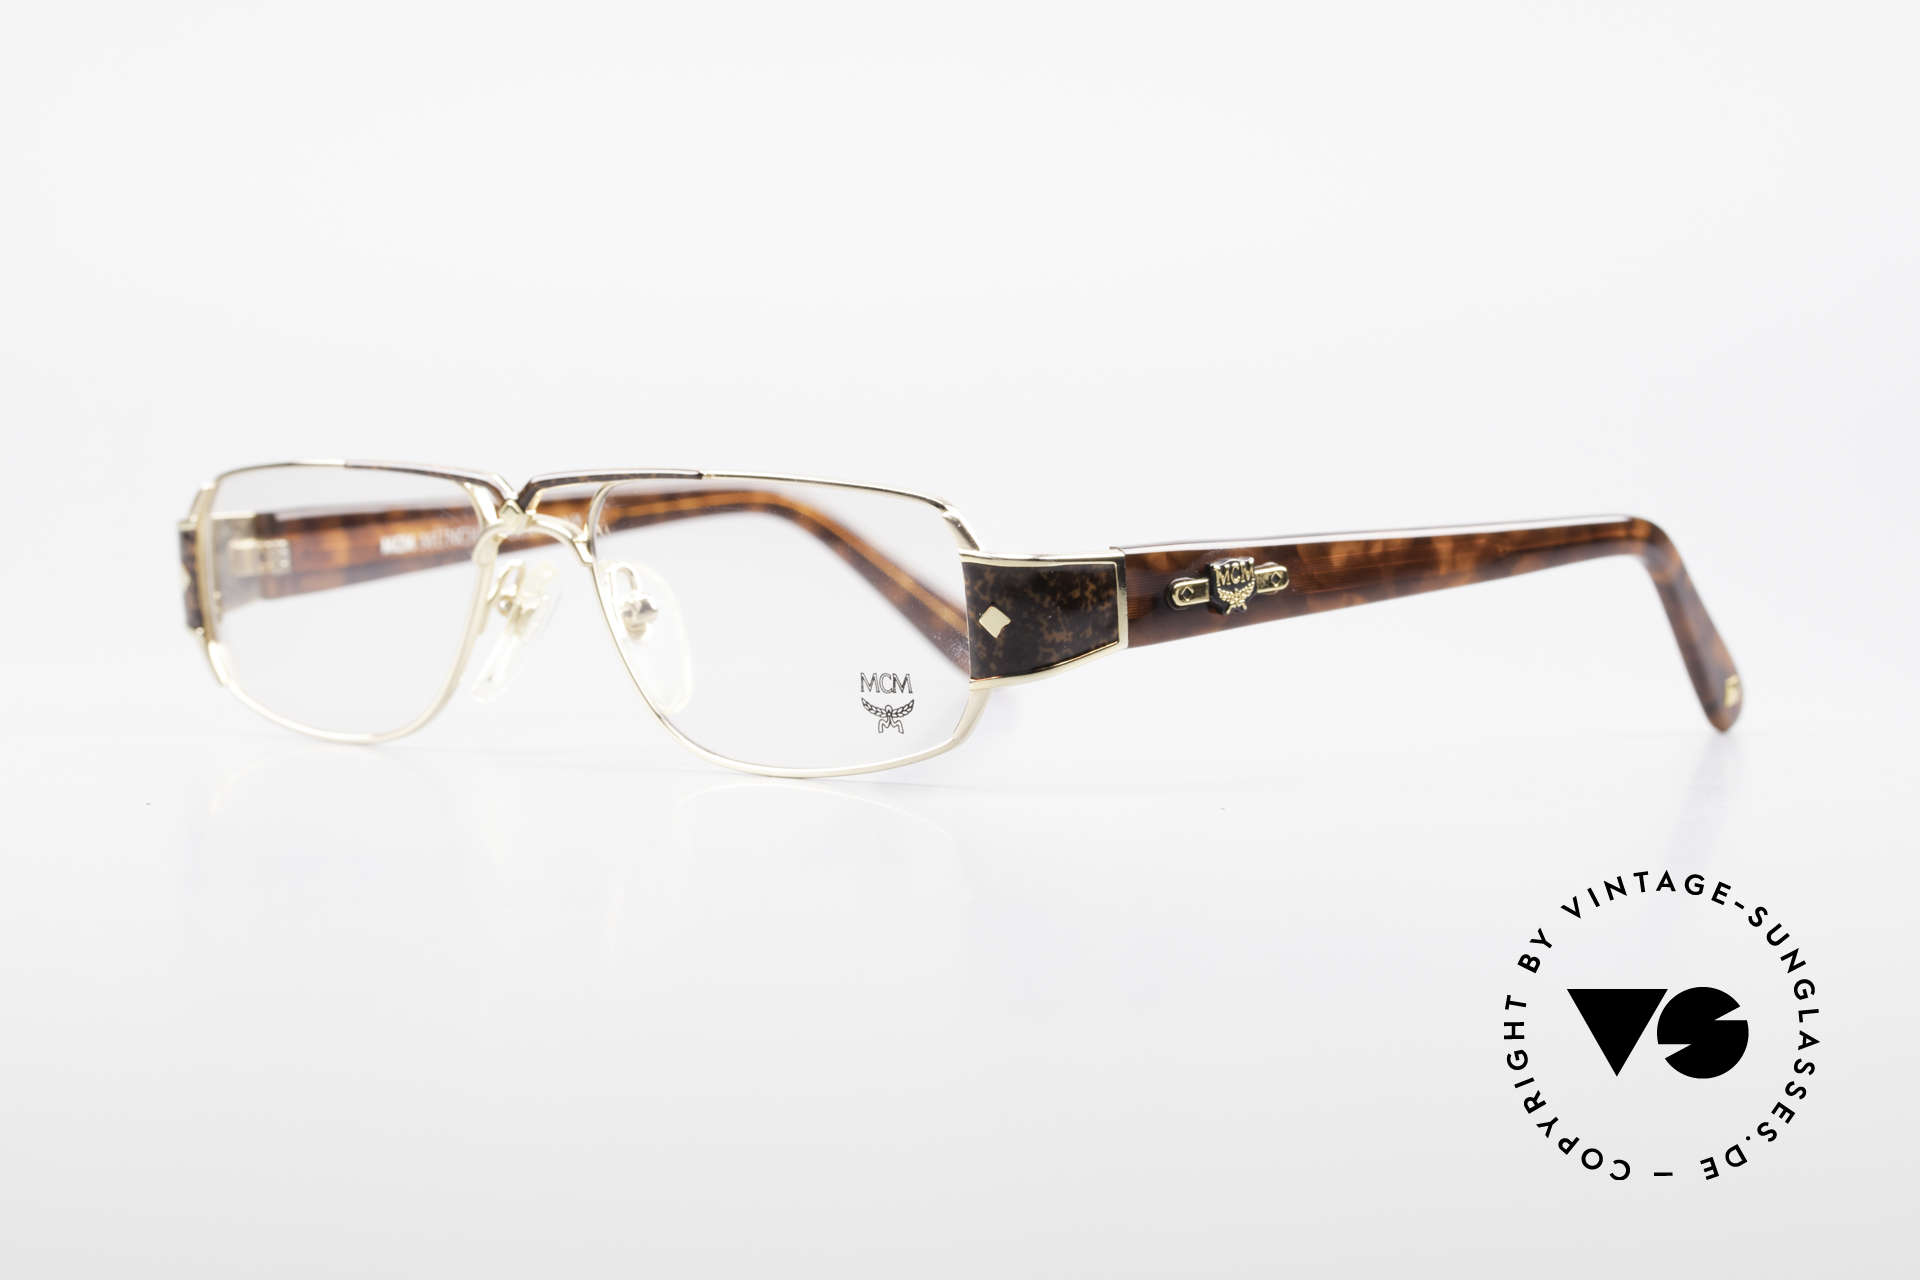 MCM München 7 80's Luxury Reading Glasses, distinctive Michael Cromer München (M-C-M), Made for Men and Women